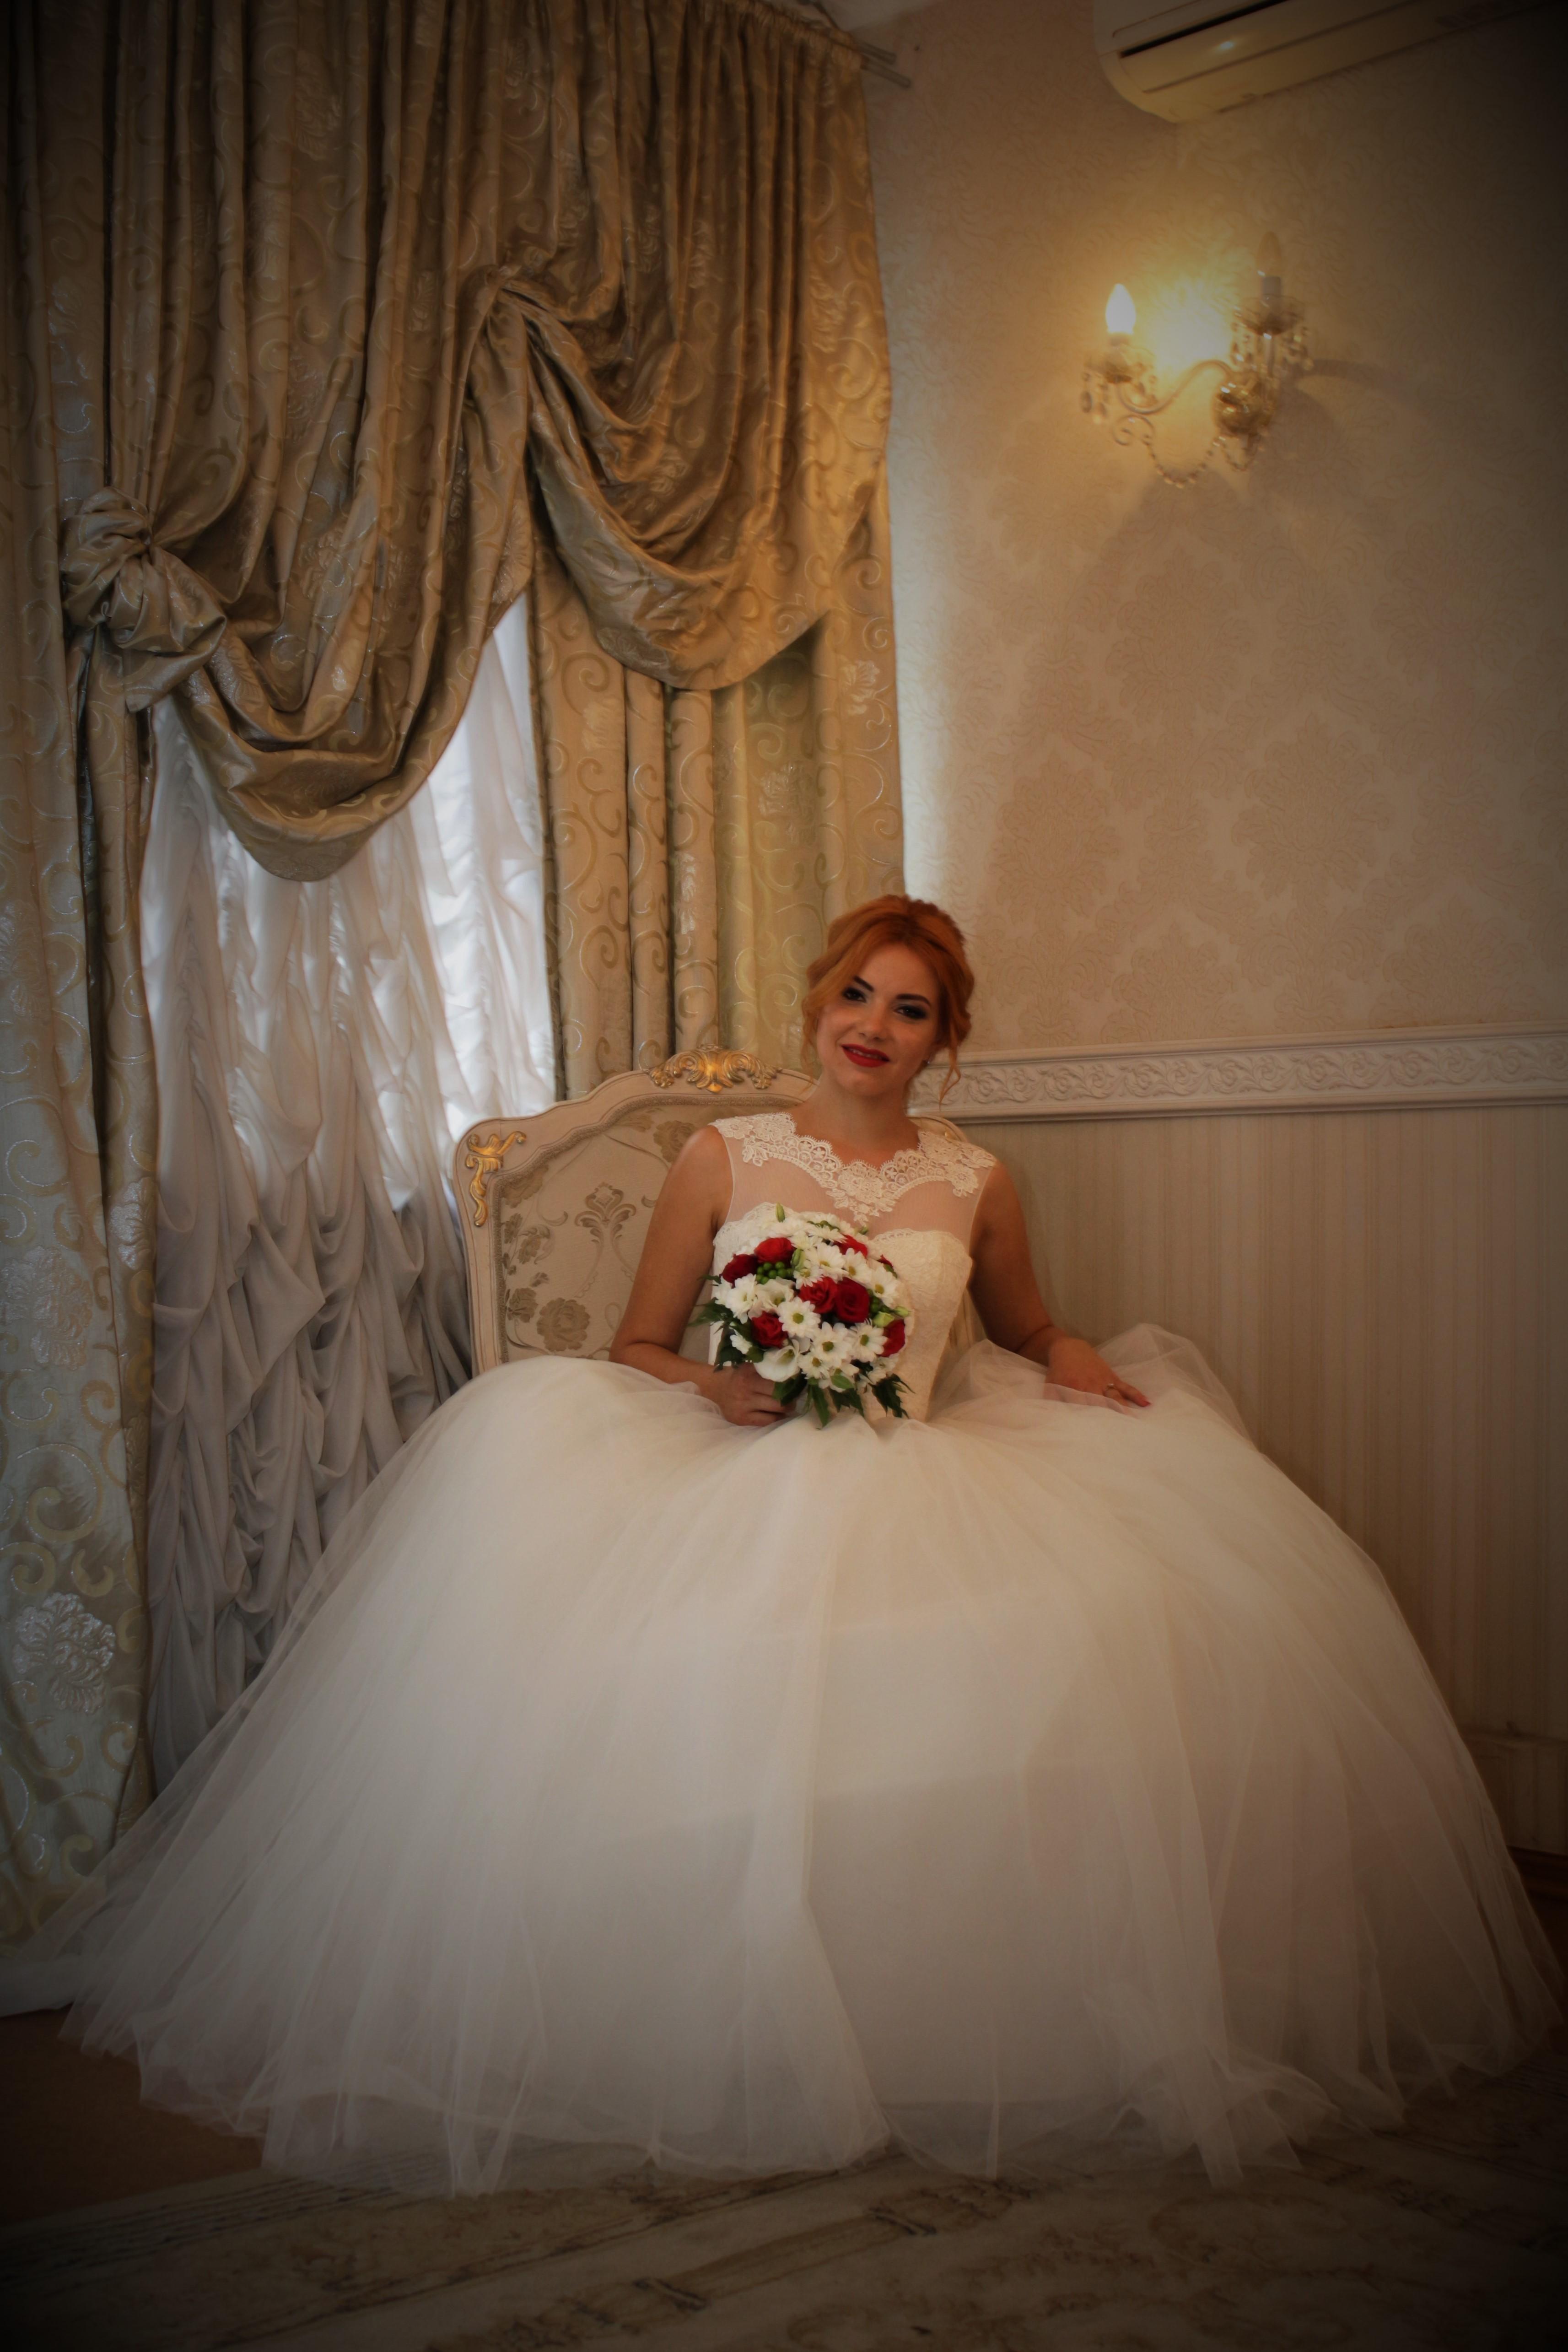 Фото Фотограф на свадьбу. 4